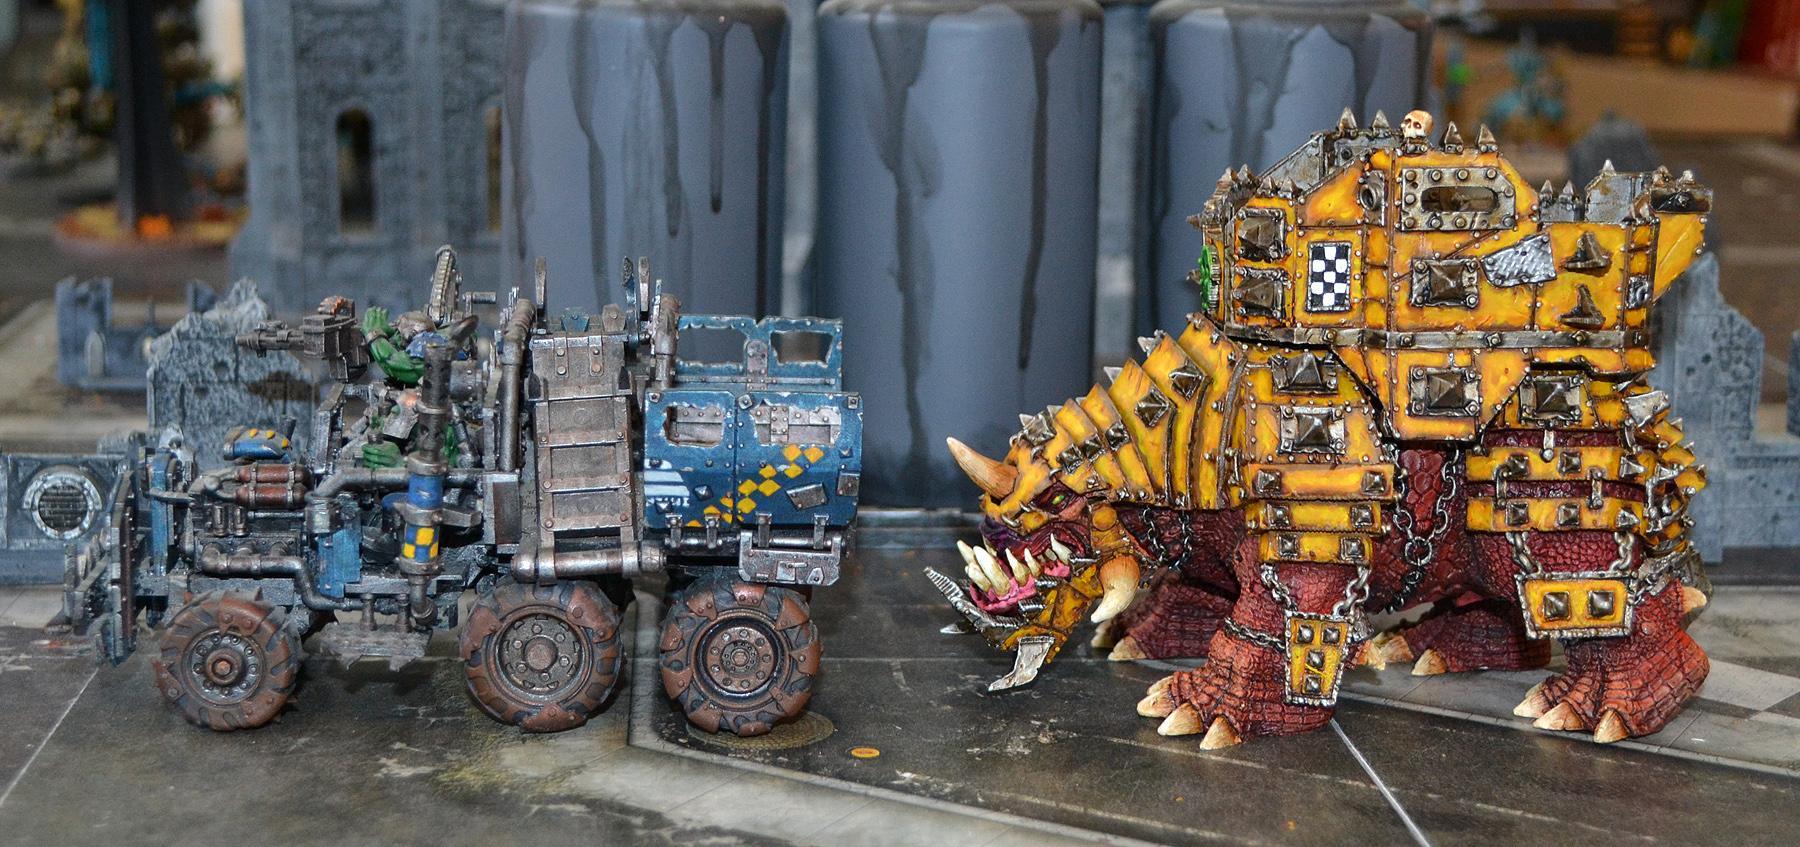 Bad Moons, Big Squiggoth, Forge World, Orks, Warhammer 40,000